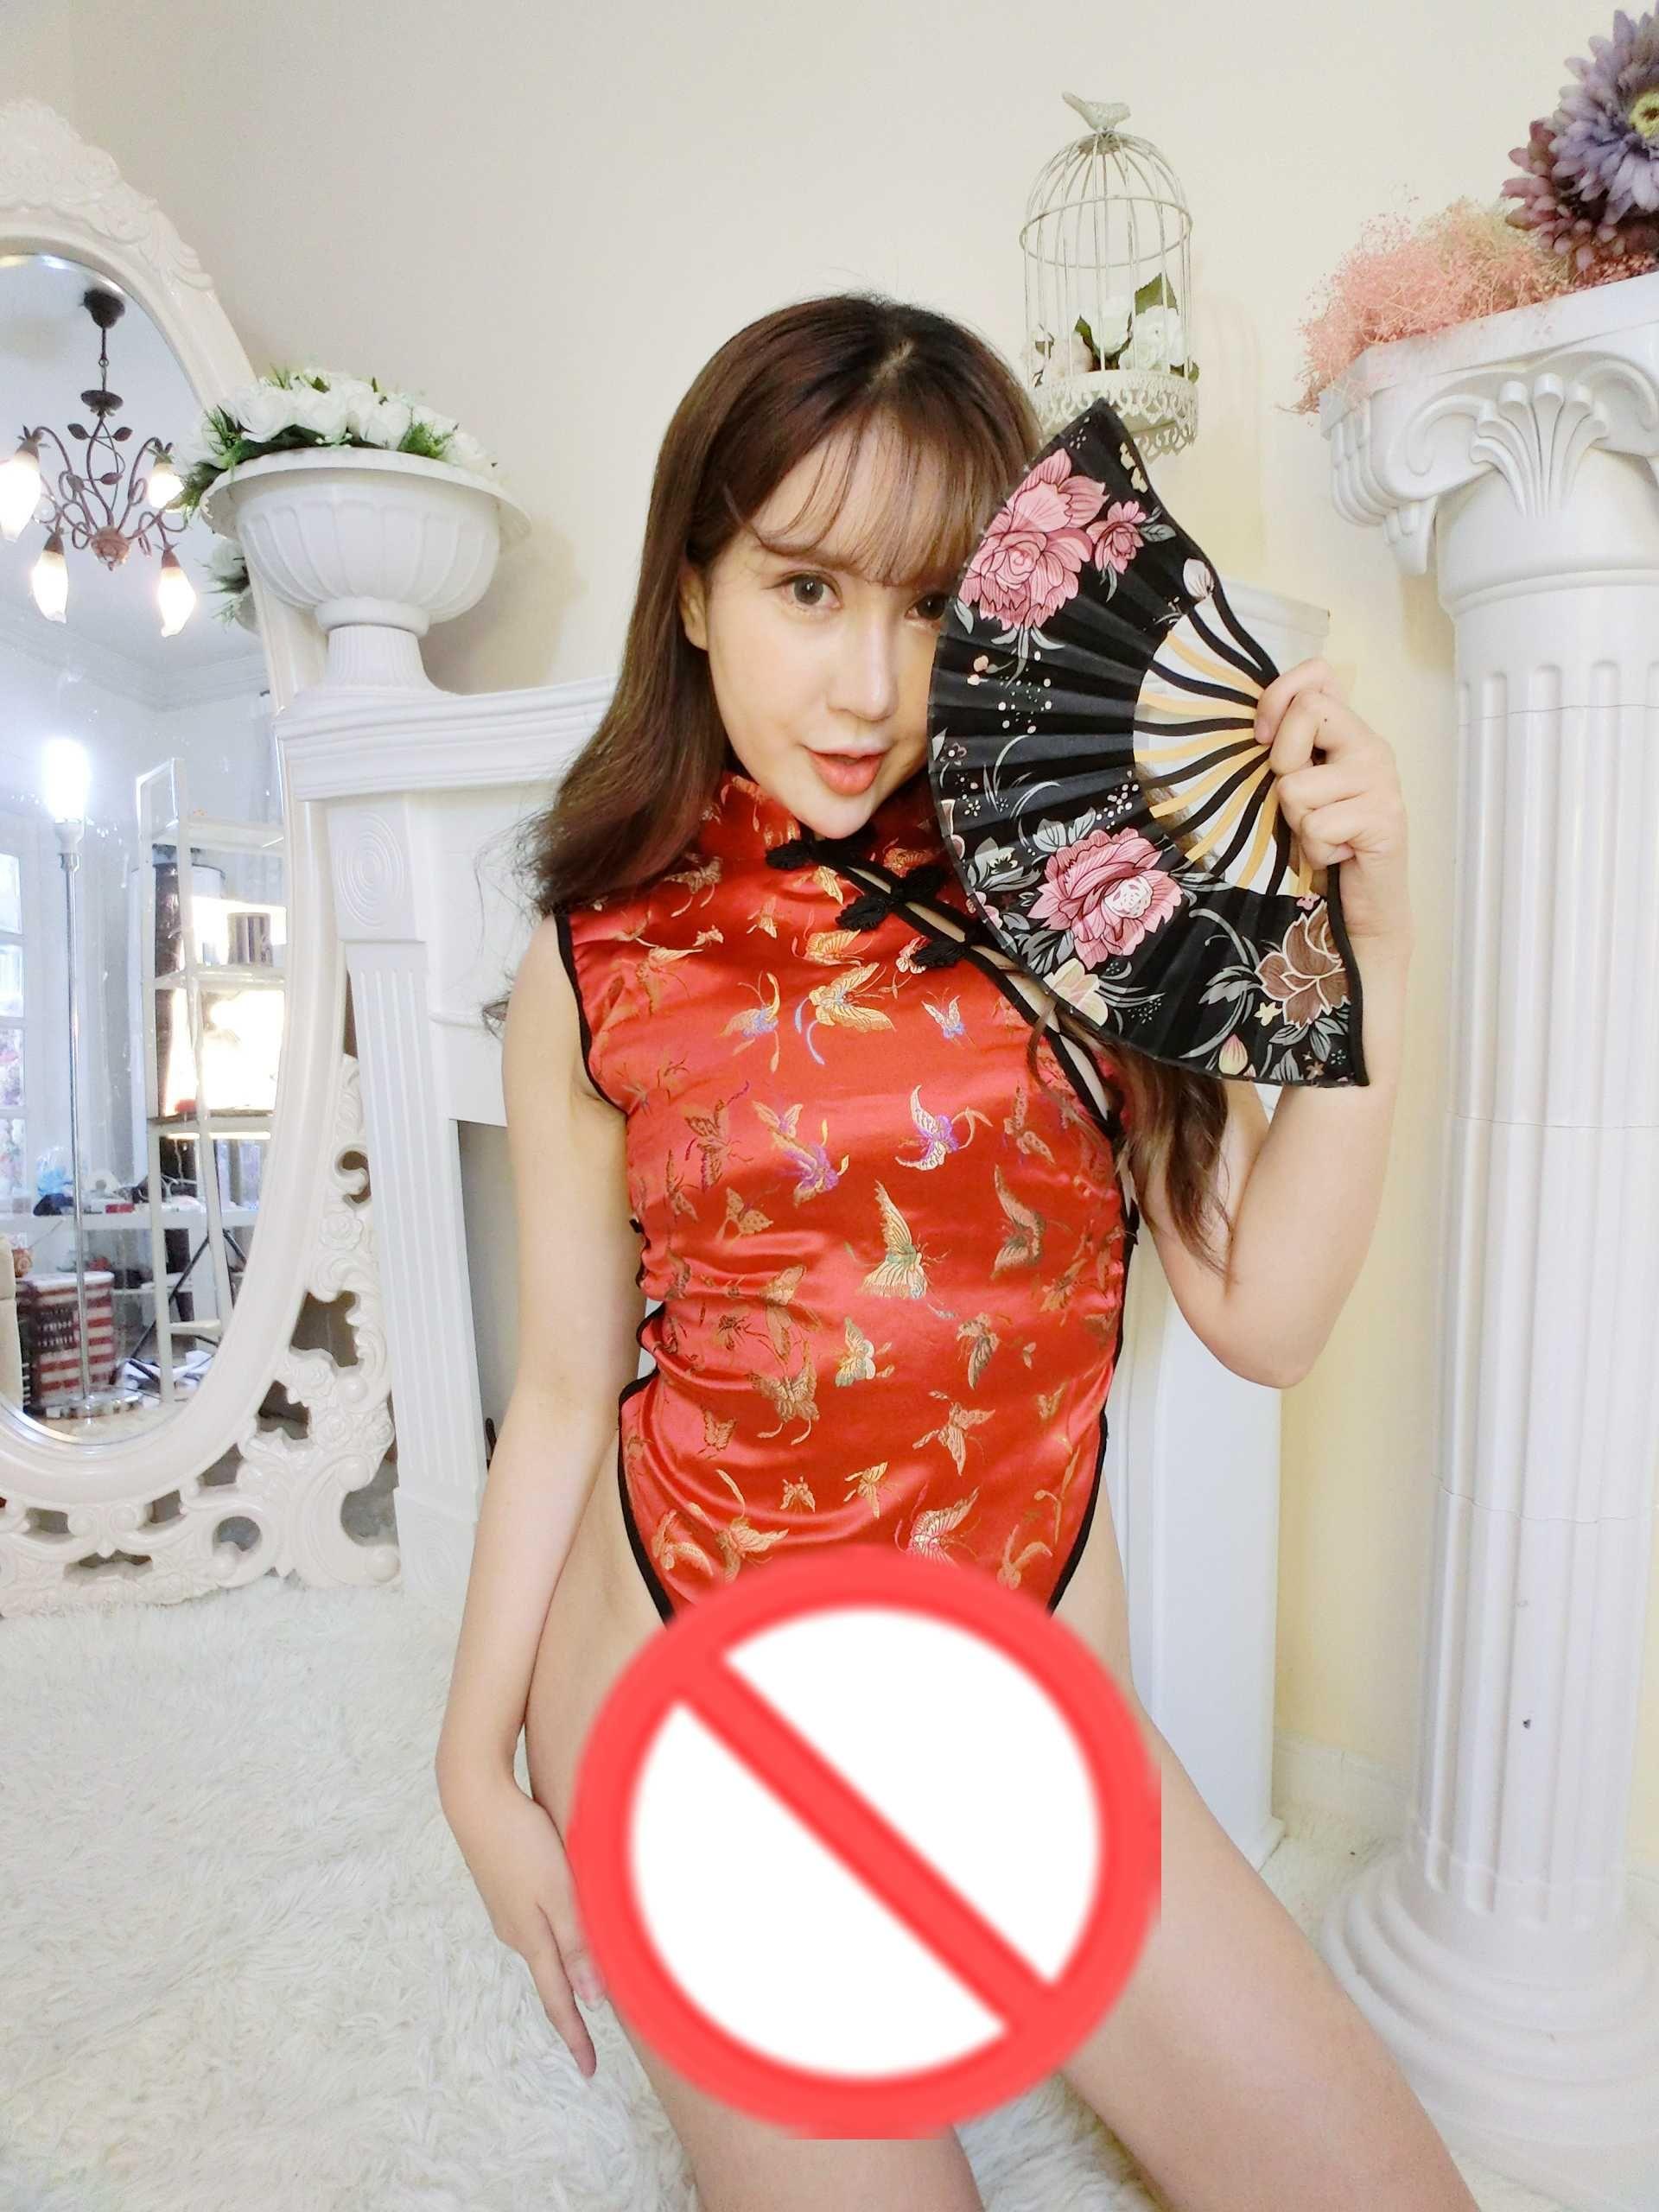 Livraison gratuite New sexy lingerie cosplay split rouge style chinois cheongsam Sexy Nightclub sexy light dress ouvrir dos mince mince serré nuit